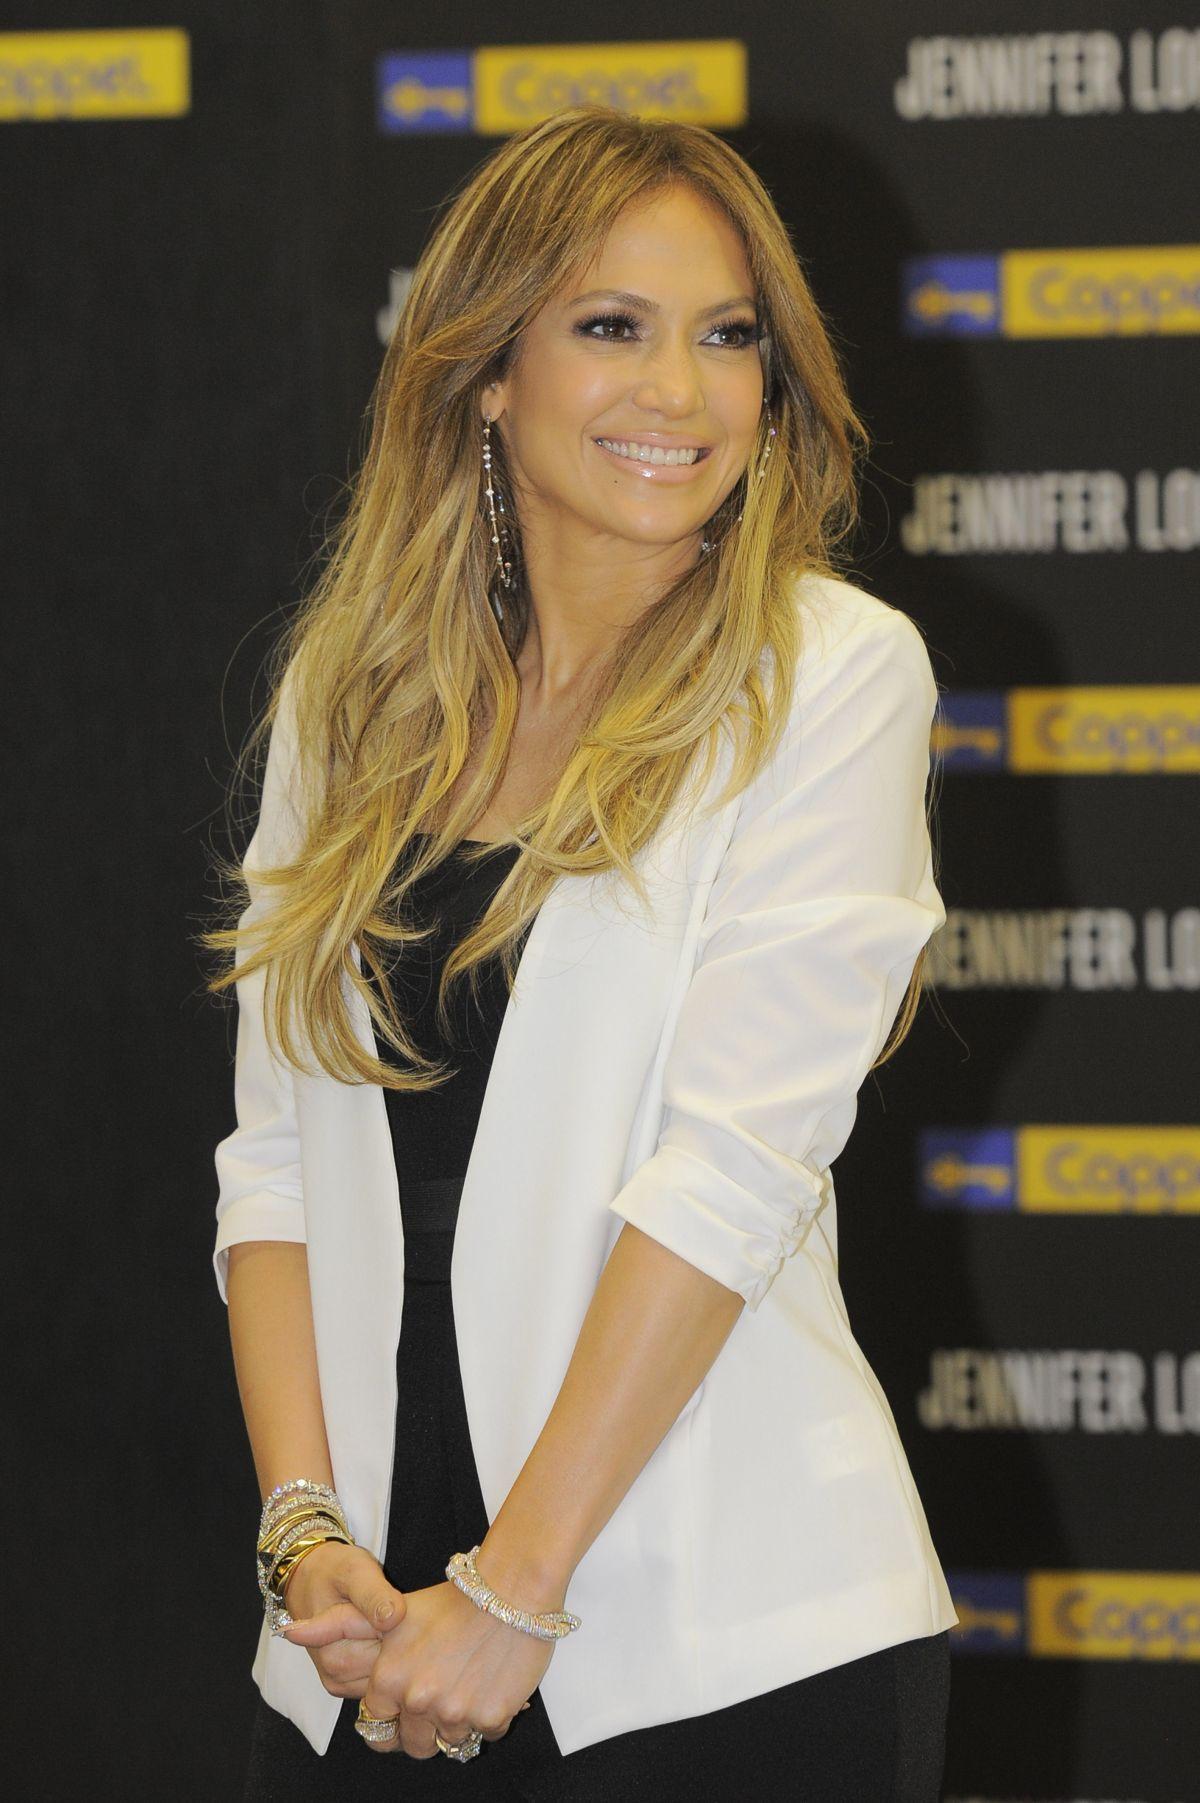 Jennifer Lopez At Coppel Store In Mexico City En 2019